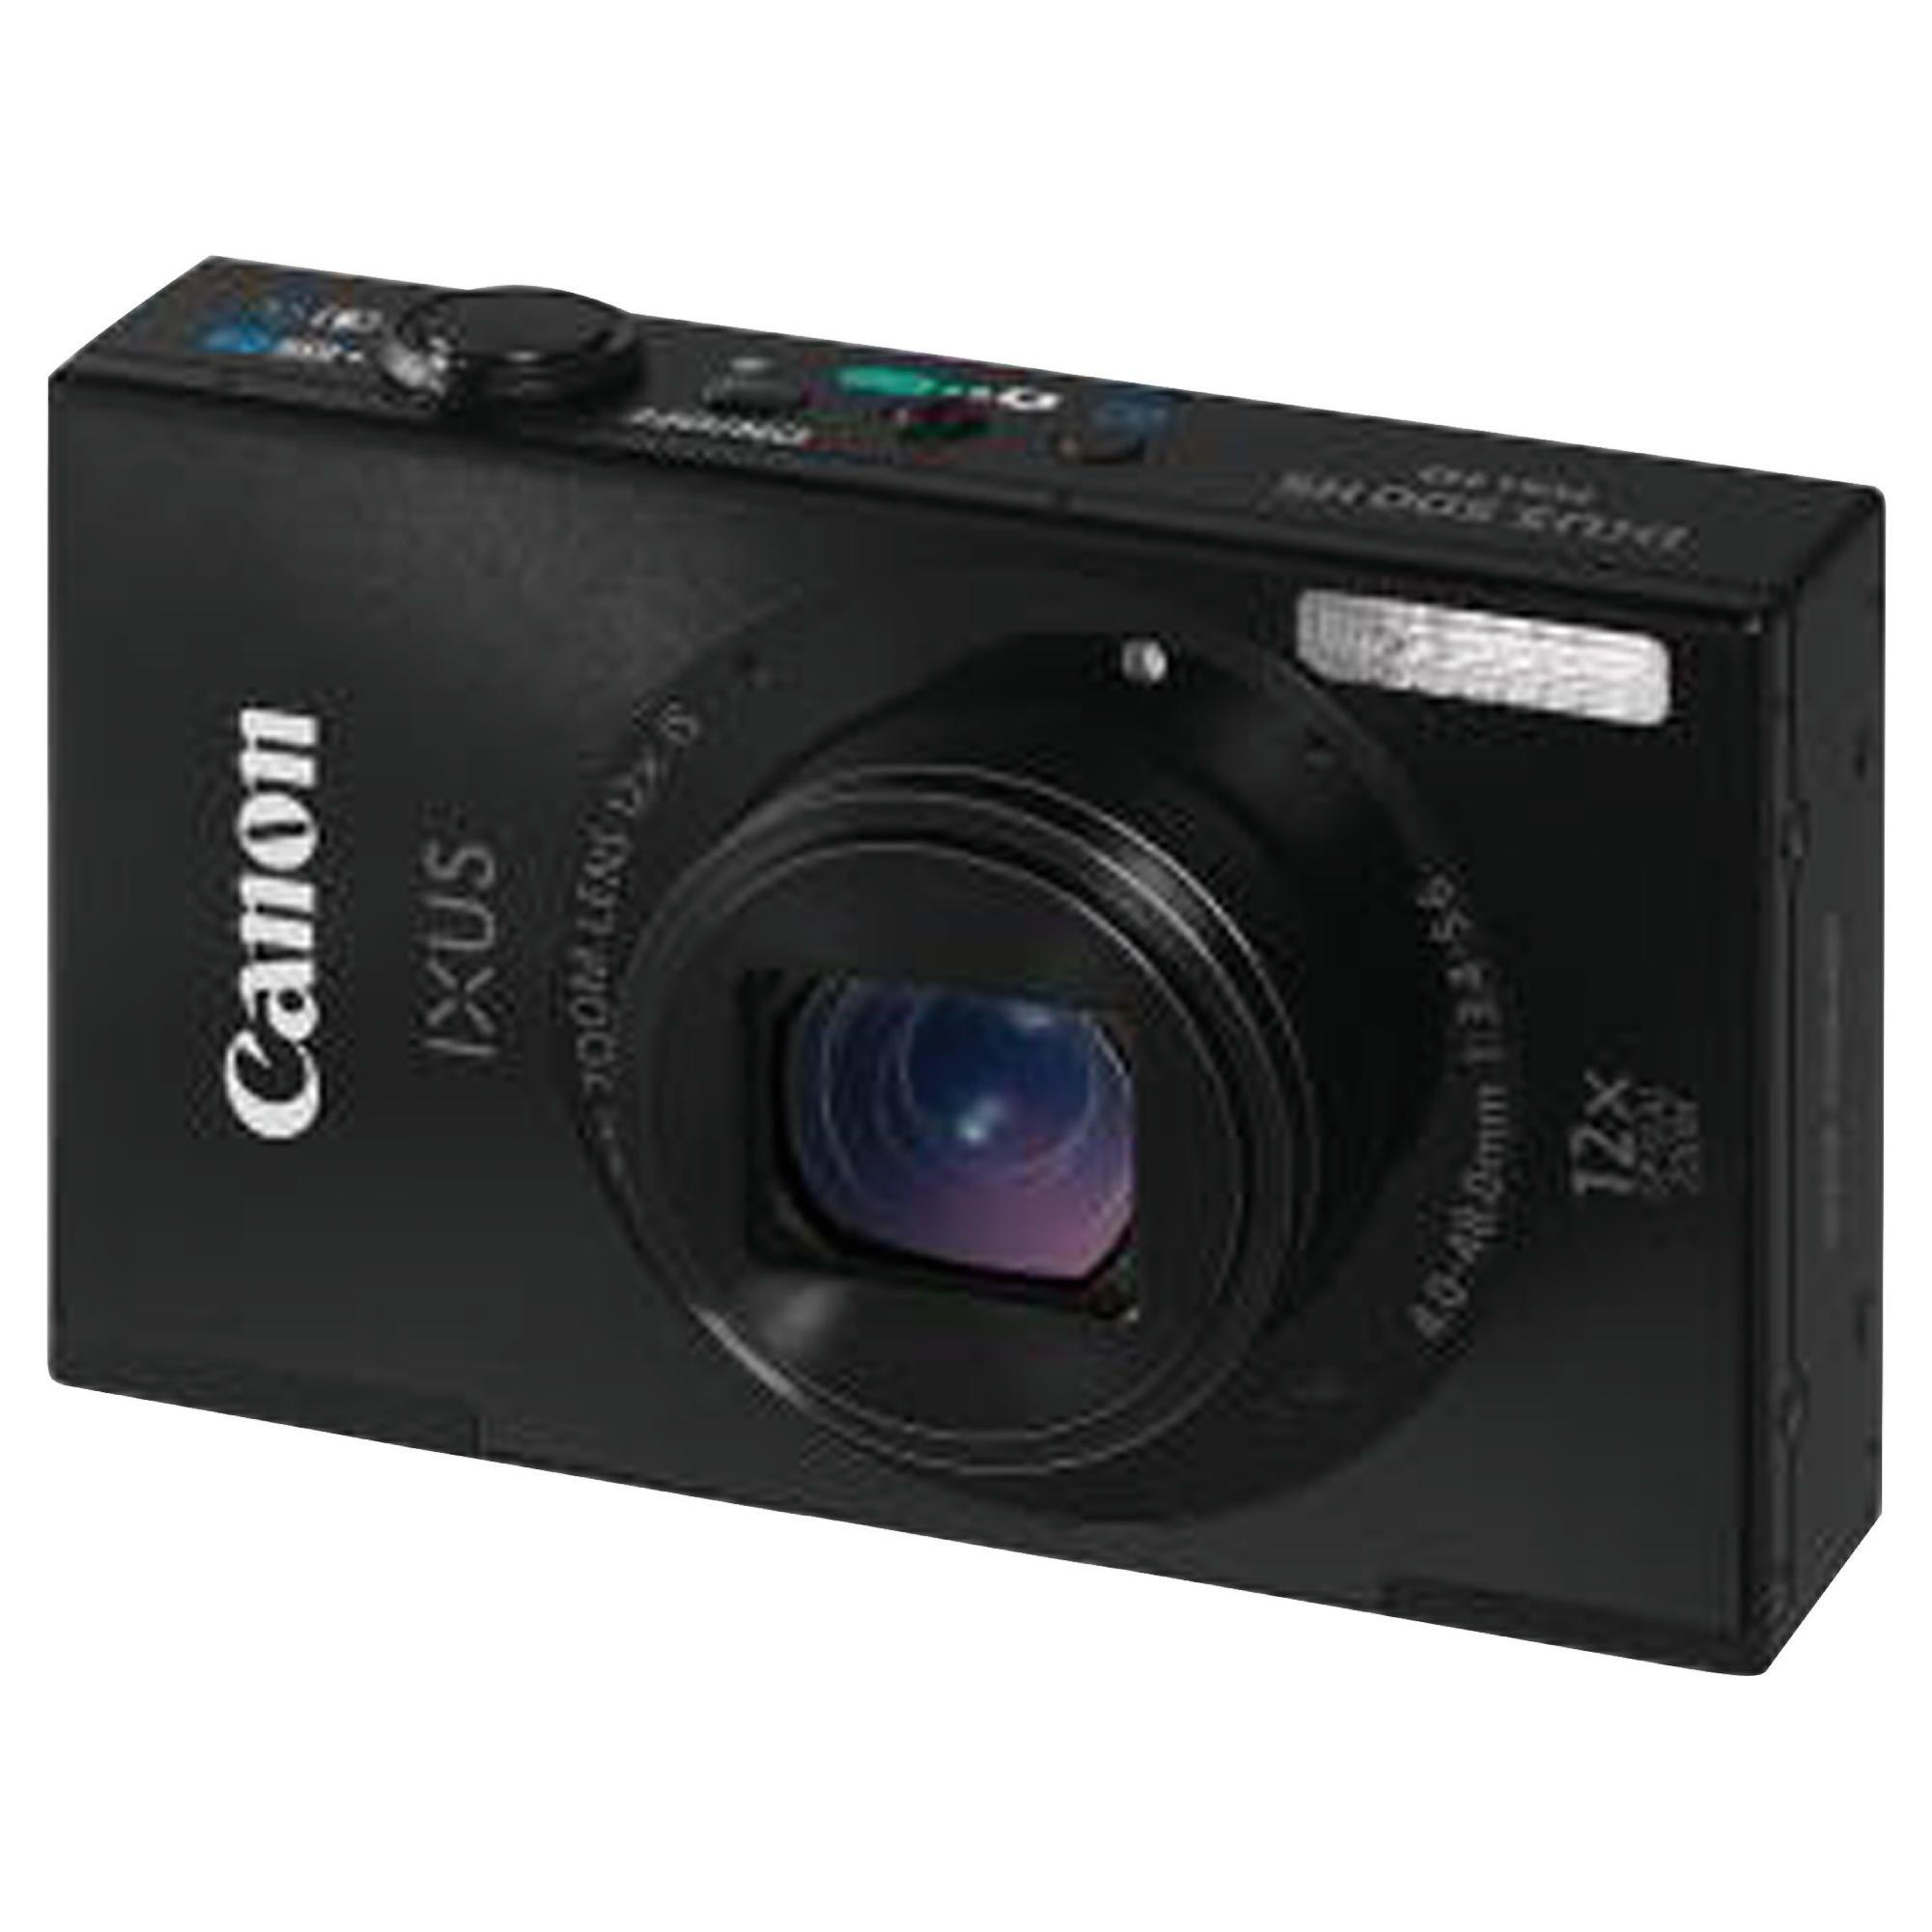 Canon Ixus 500 HS Black Digital Camera